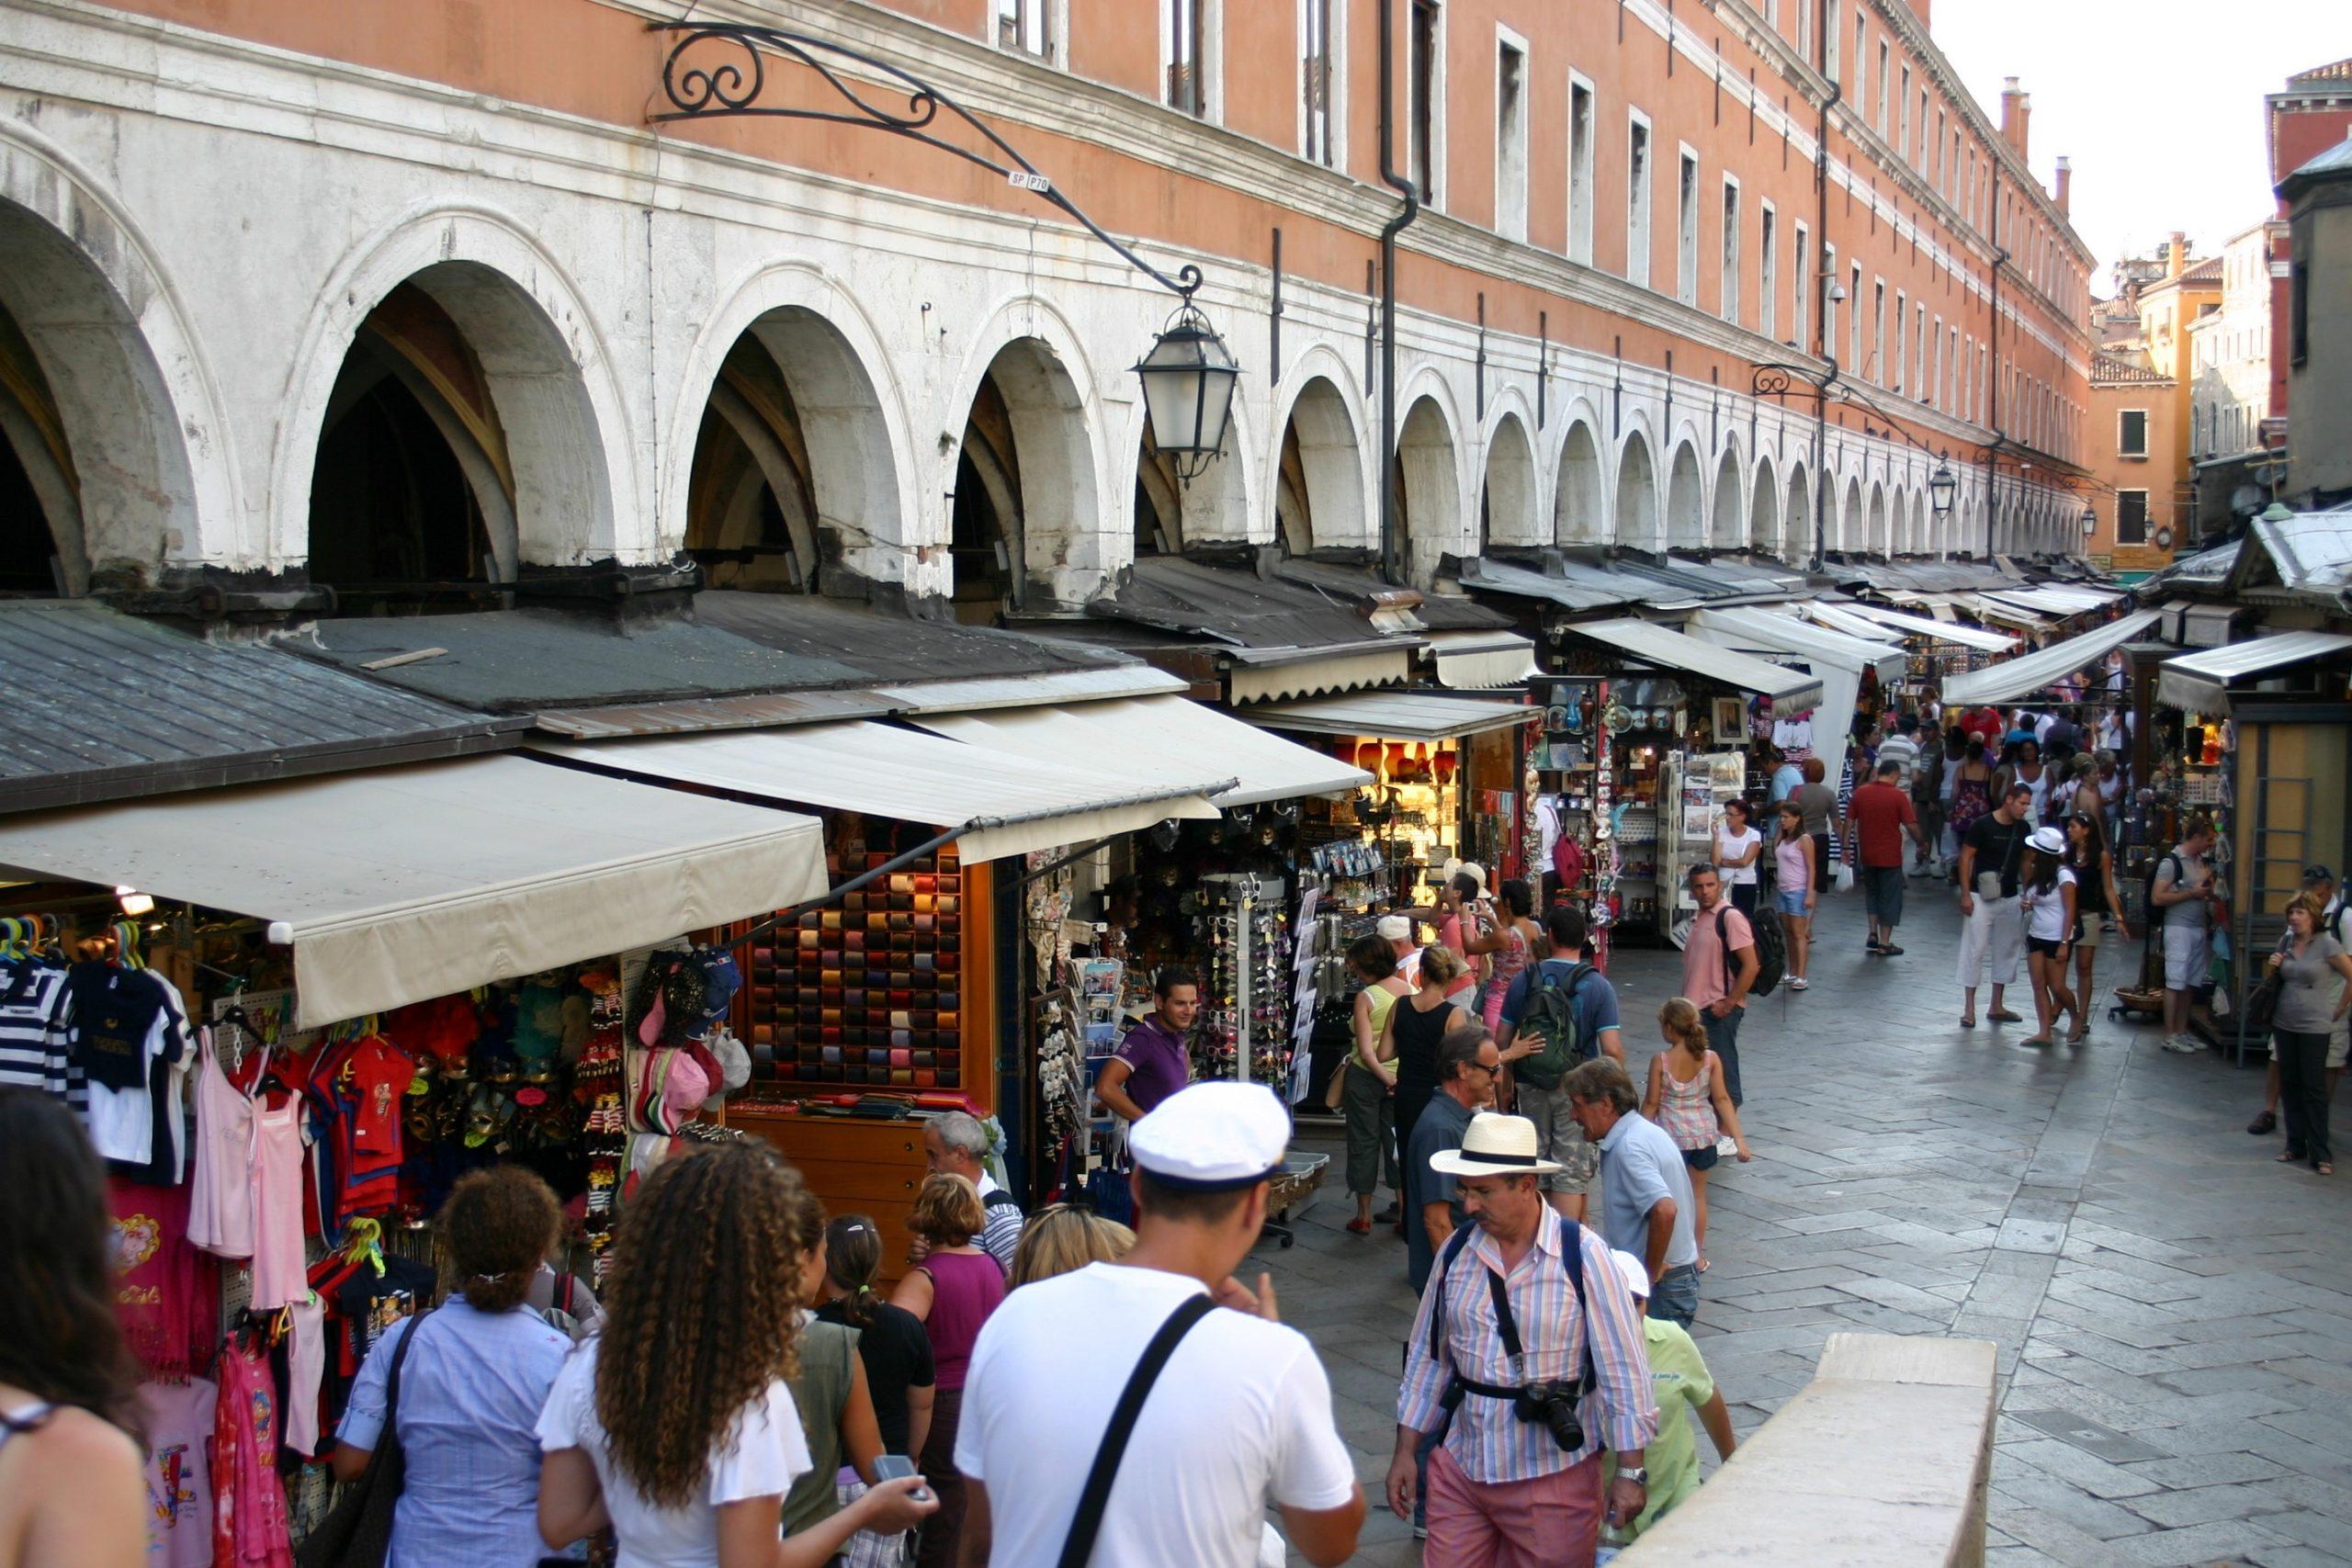 Veneto, ambulanti in crisi. E Venezia rimpiange i vecchi problemi